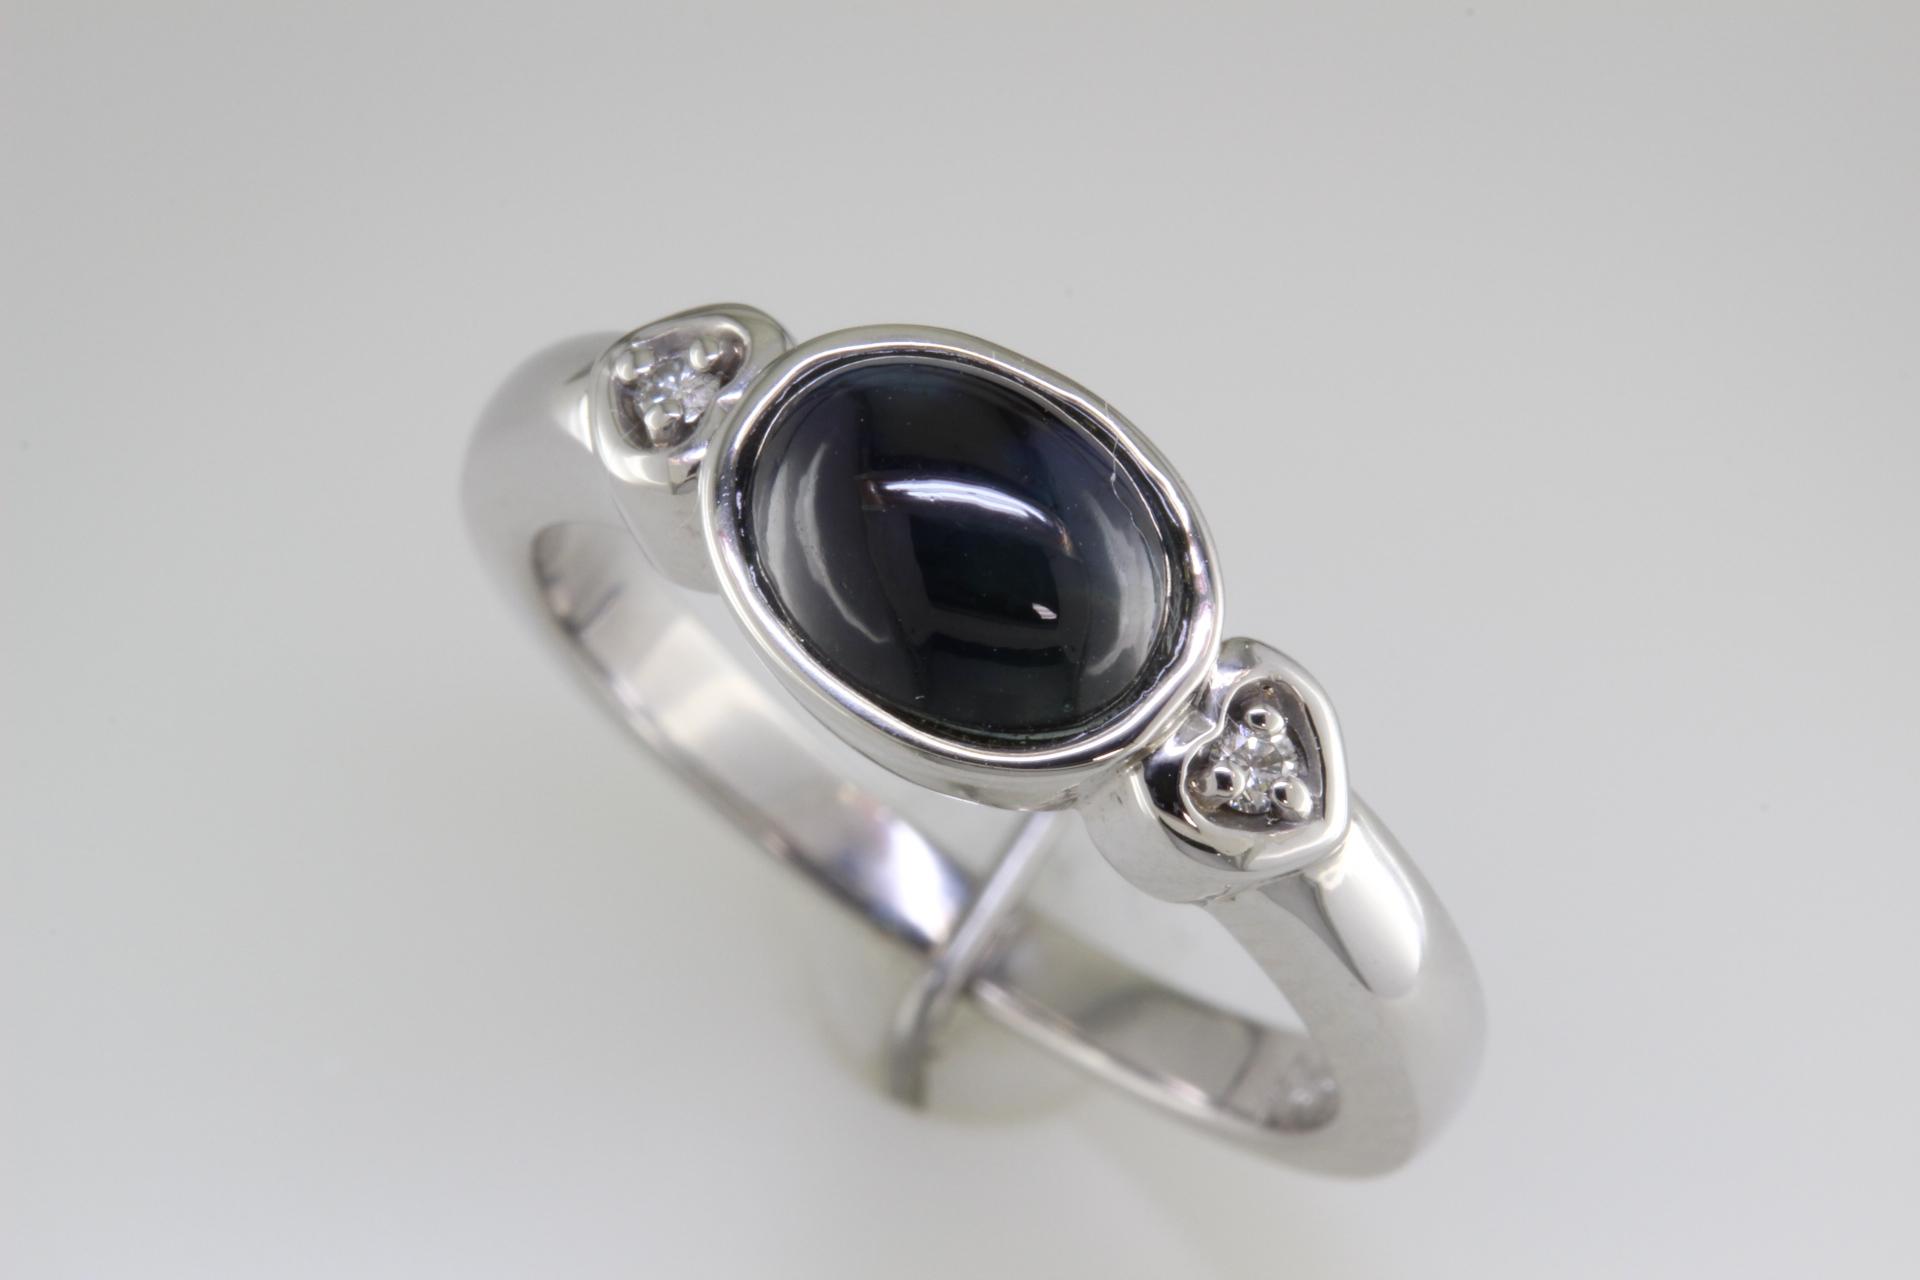 Cabachon Sapphire ring